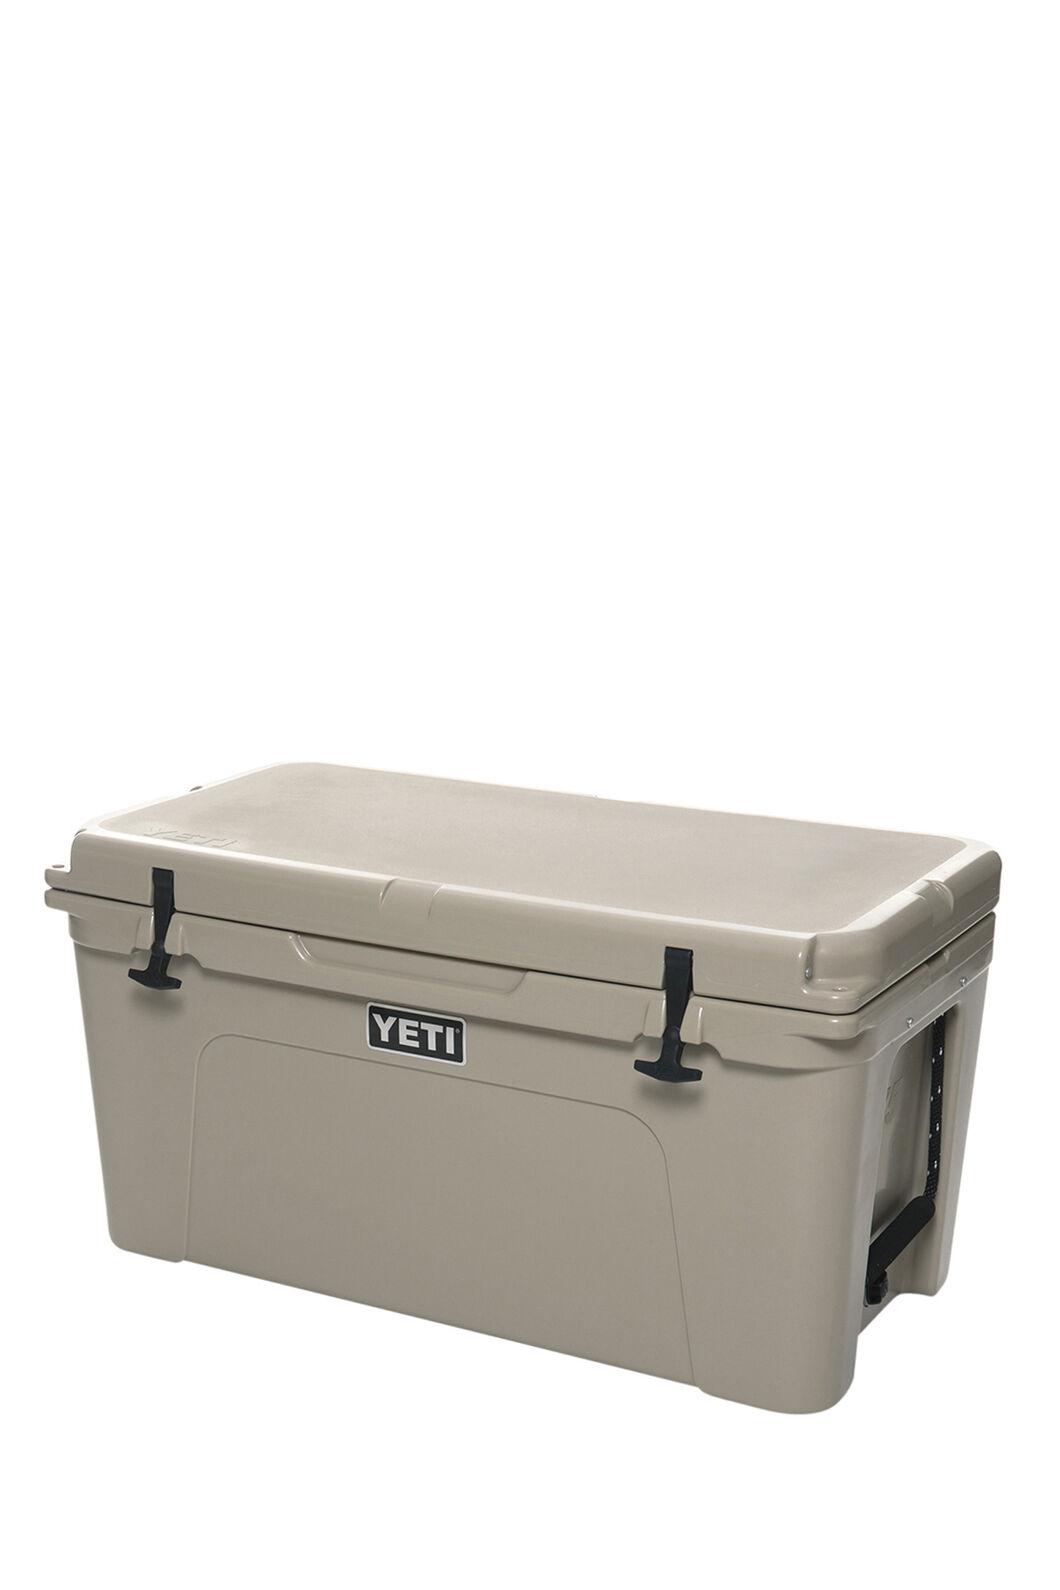 Yeti Tundra 75 Cooler Tan 75L, None, hi-res